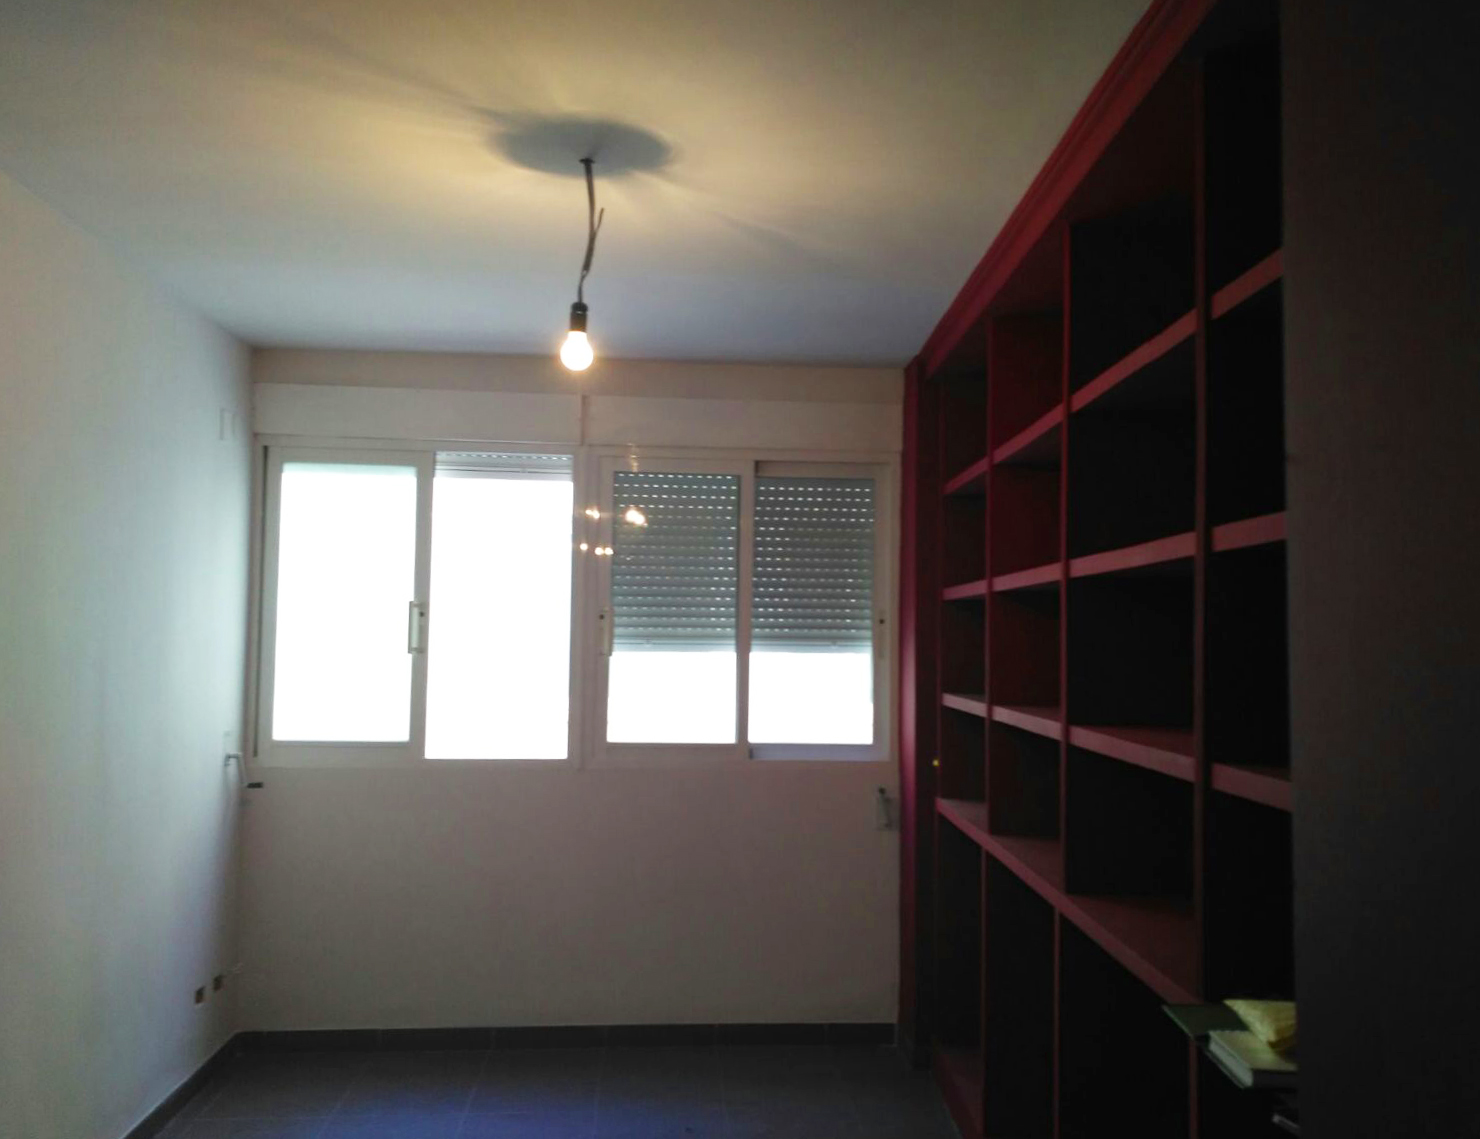 Oficinas castell n c alloza estancia inmobiliaria for Oficinas bankinter castellon